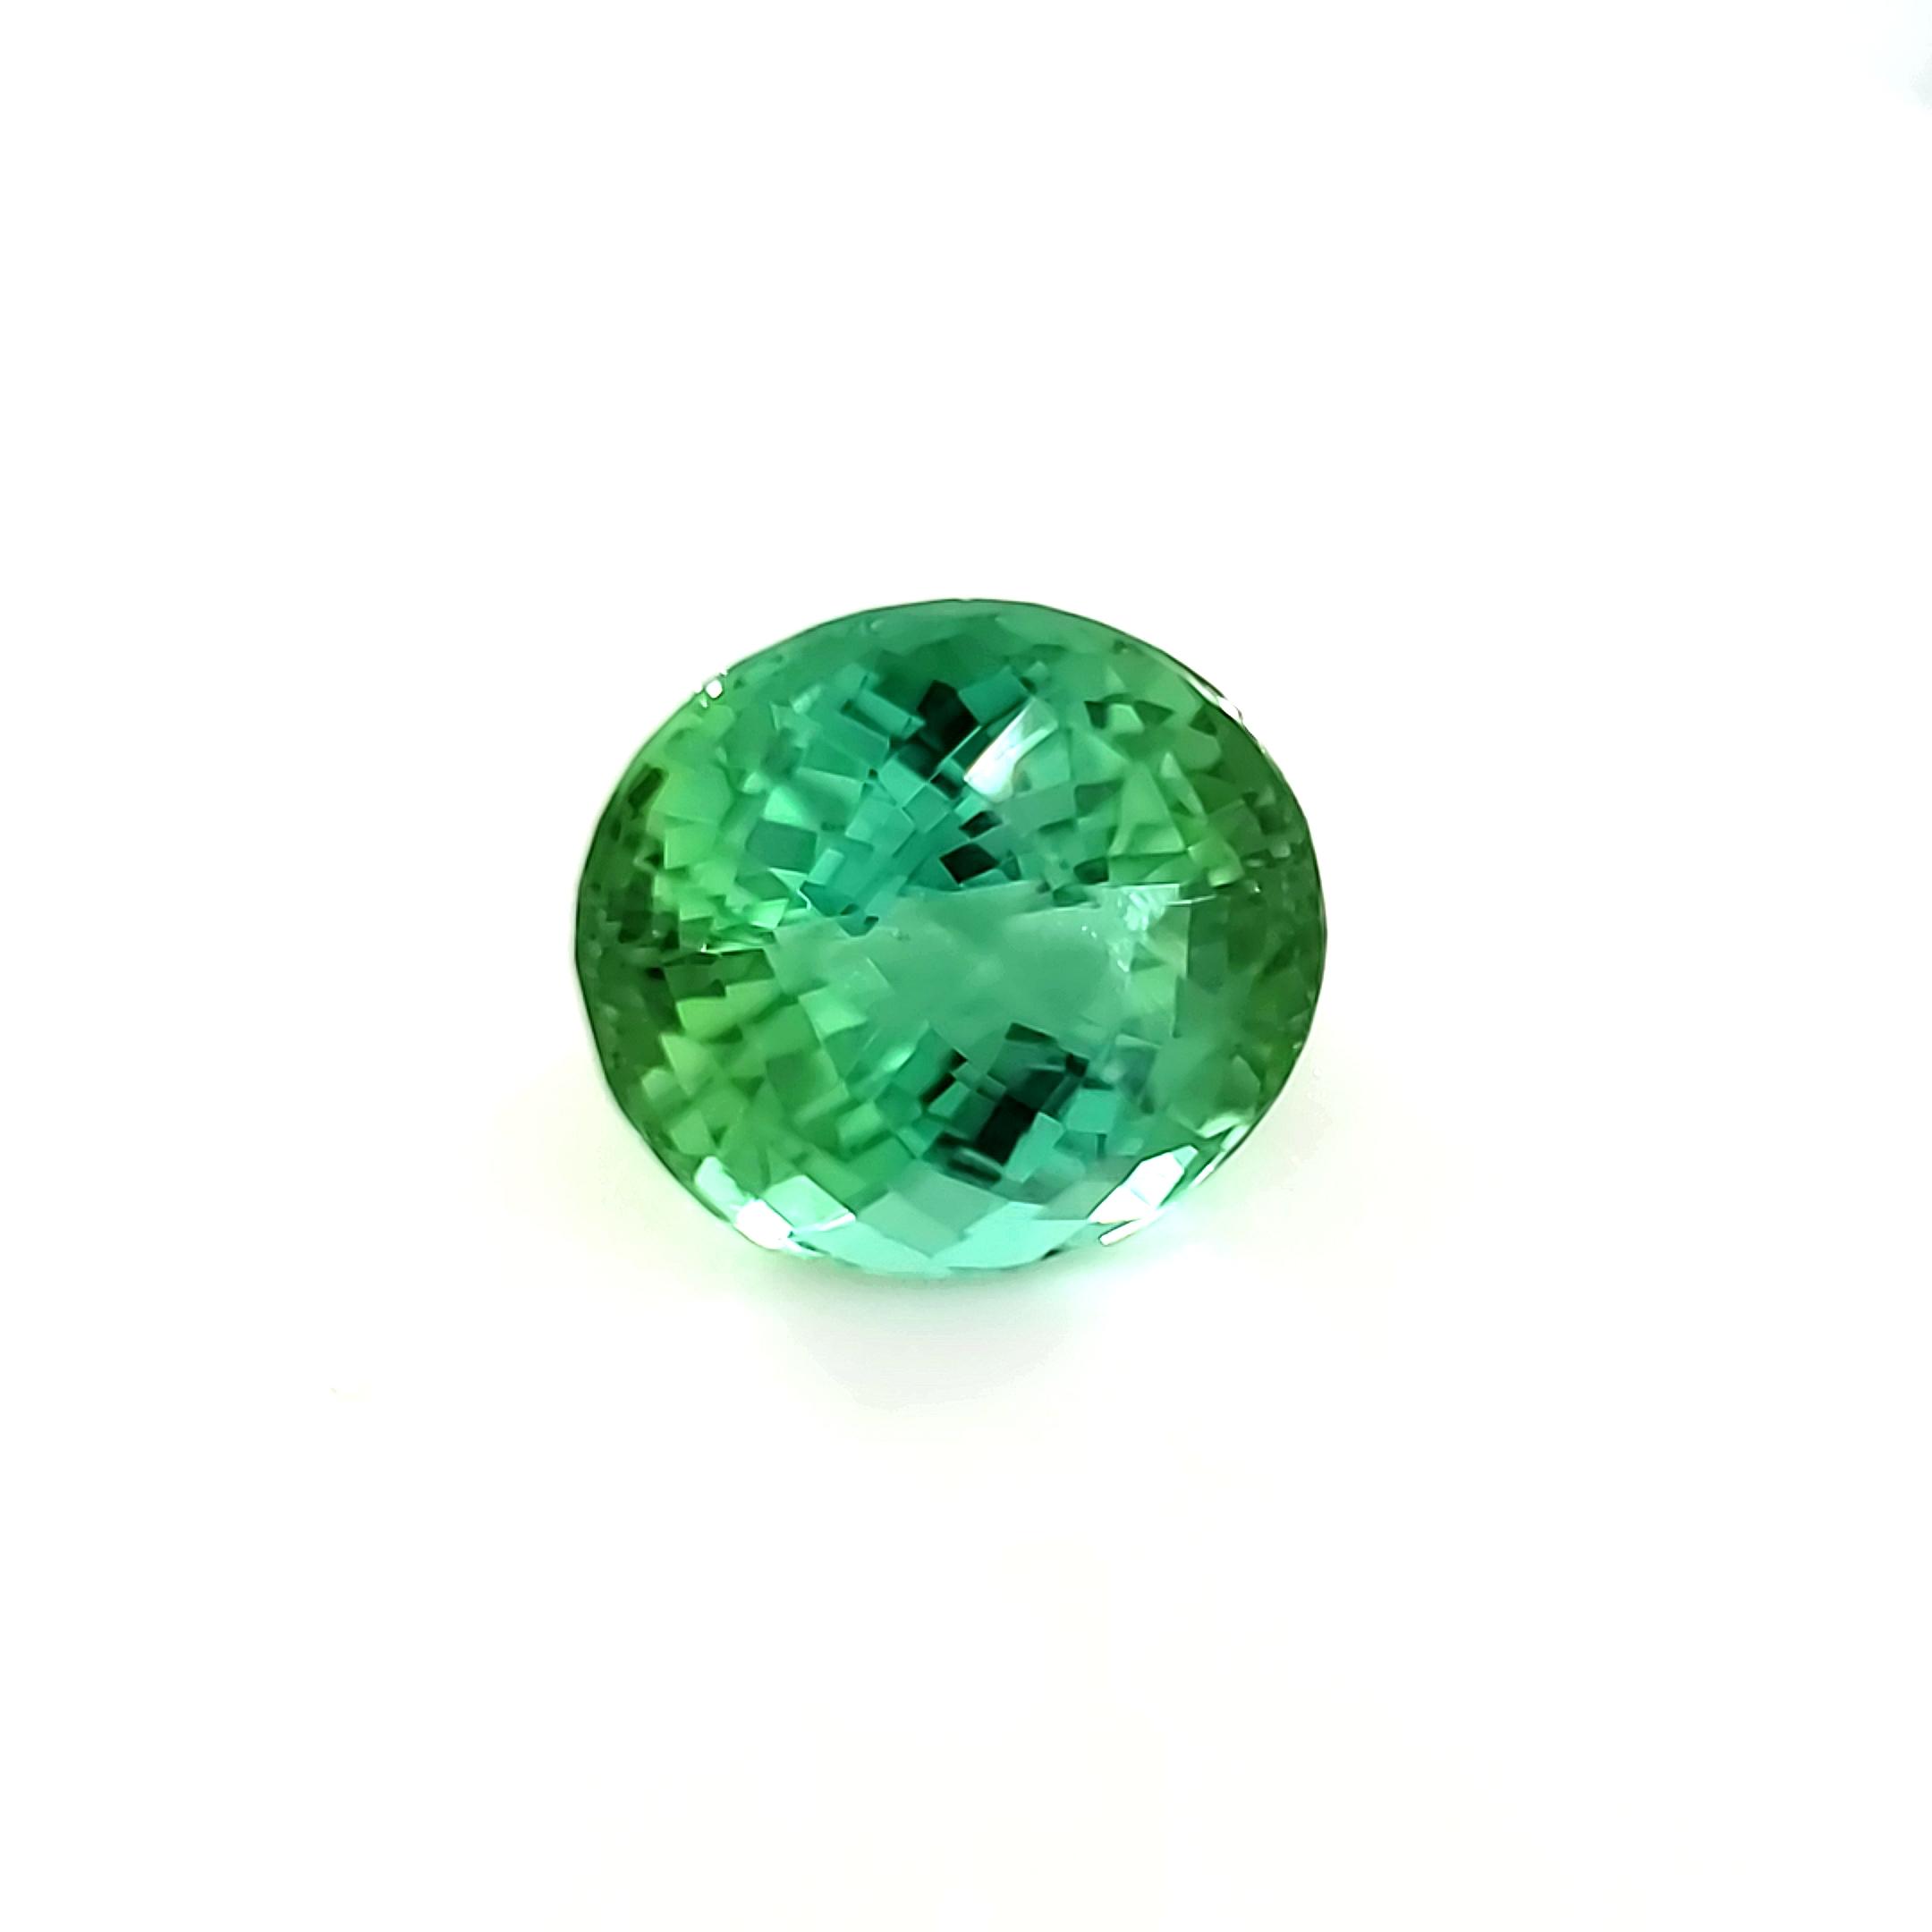 2.63 Green Tourmaline